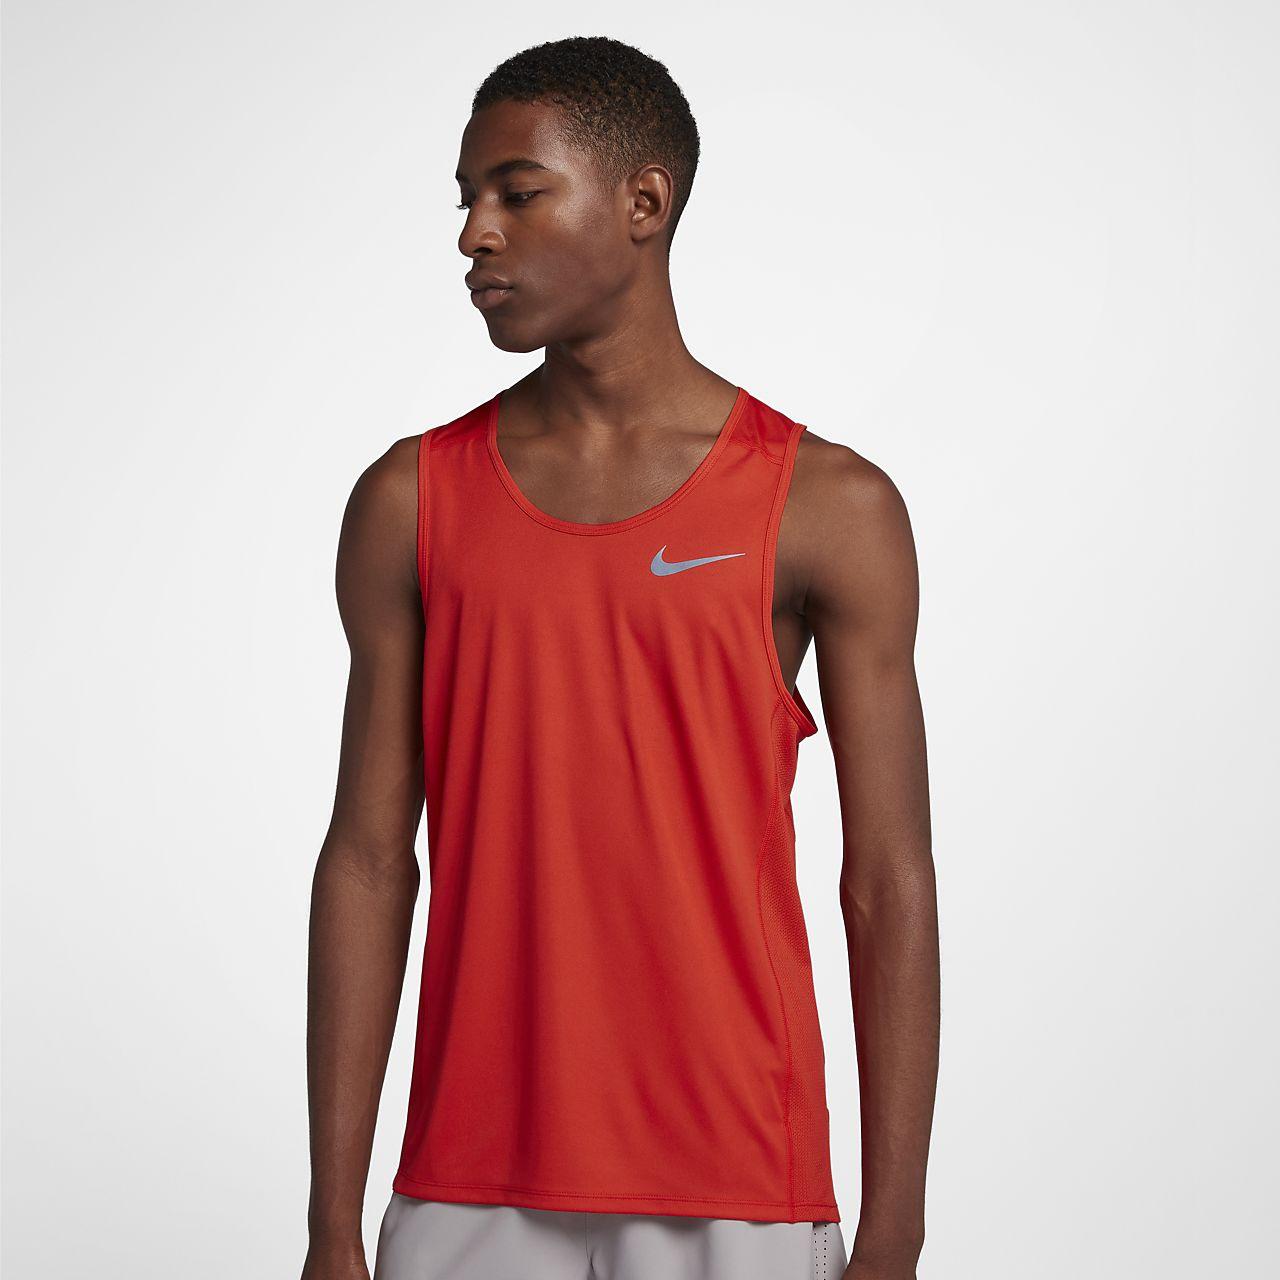 Nike Cool Miler Hardlooptanktop voor heren